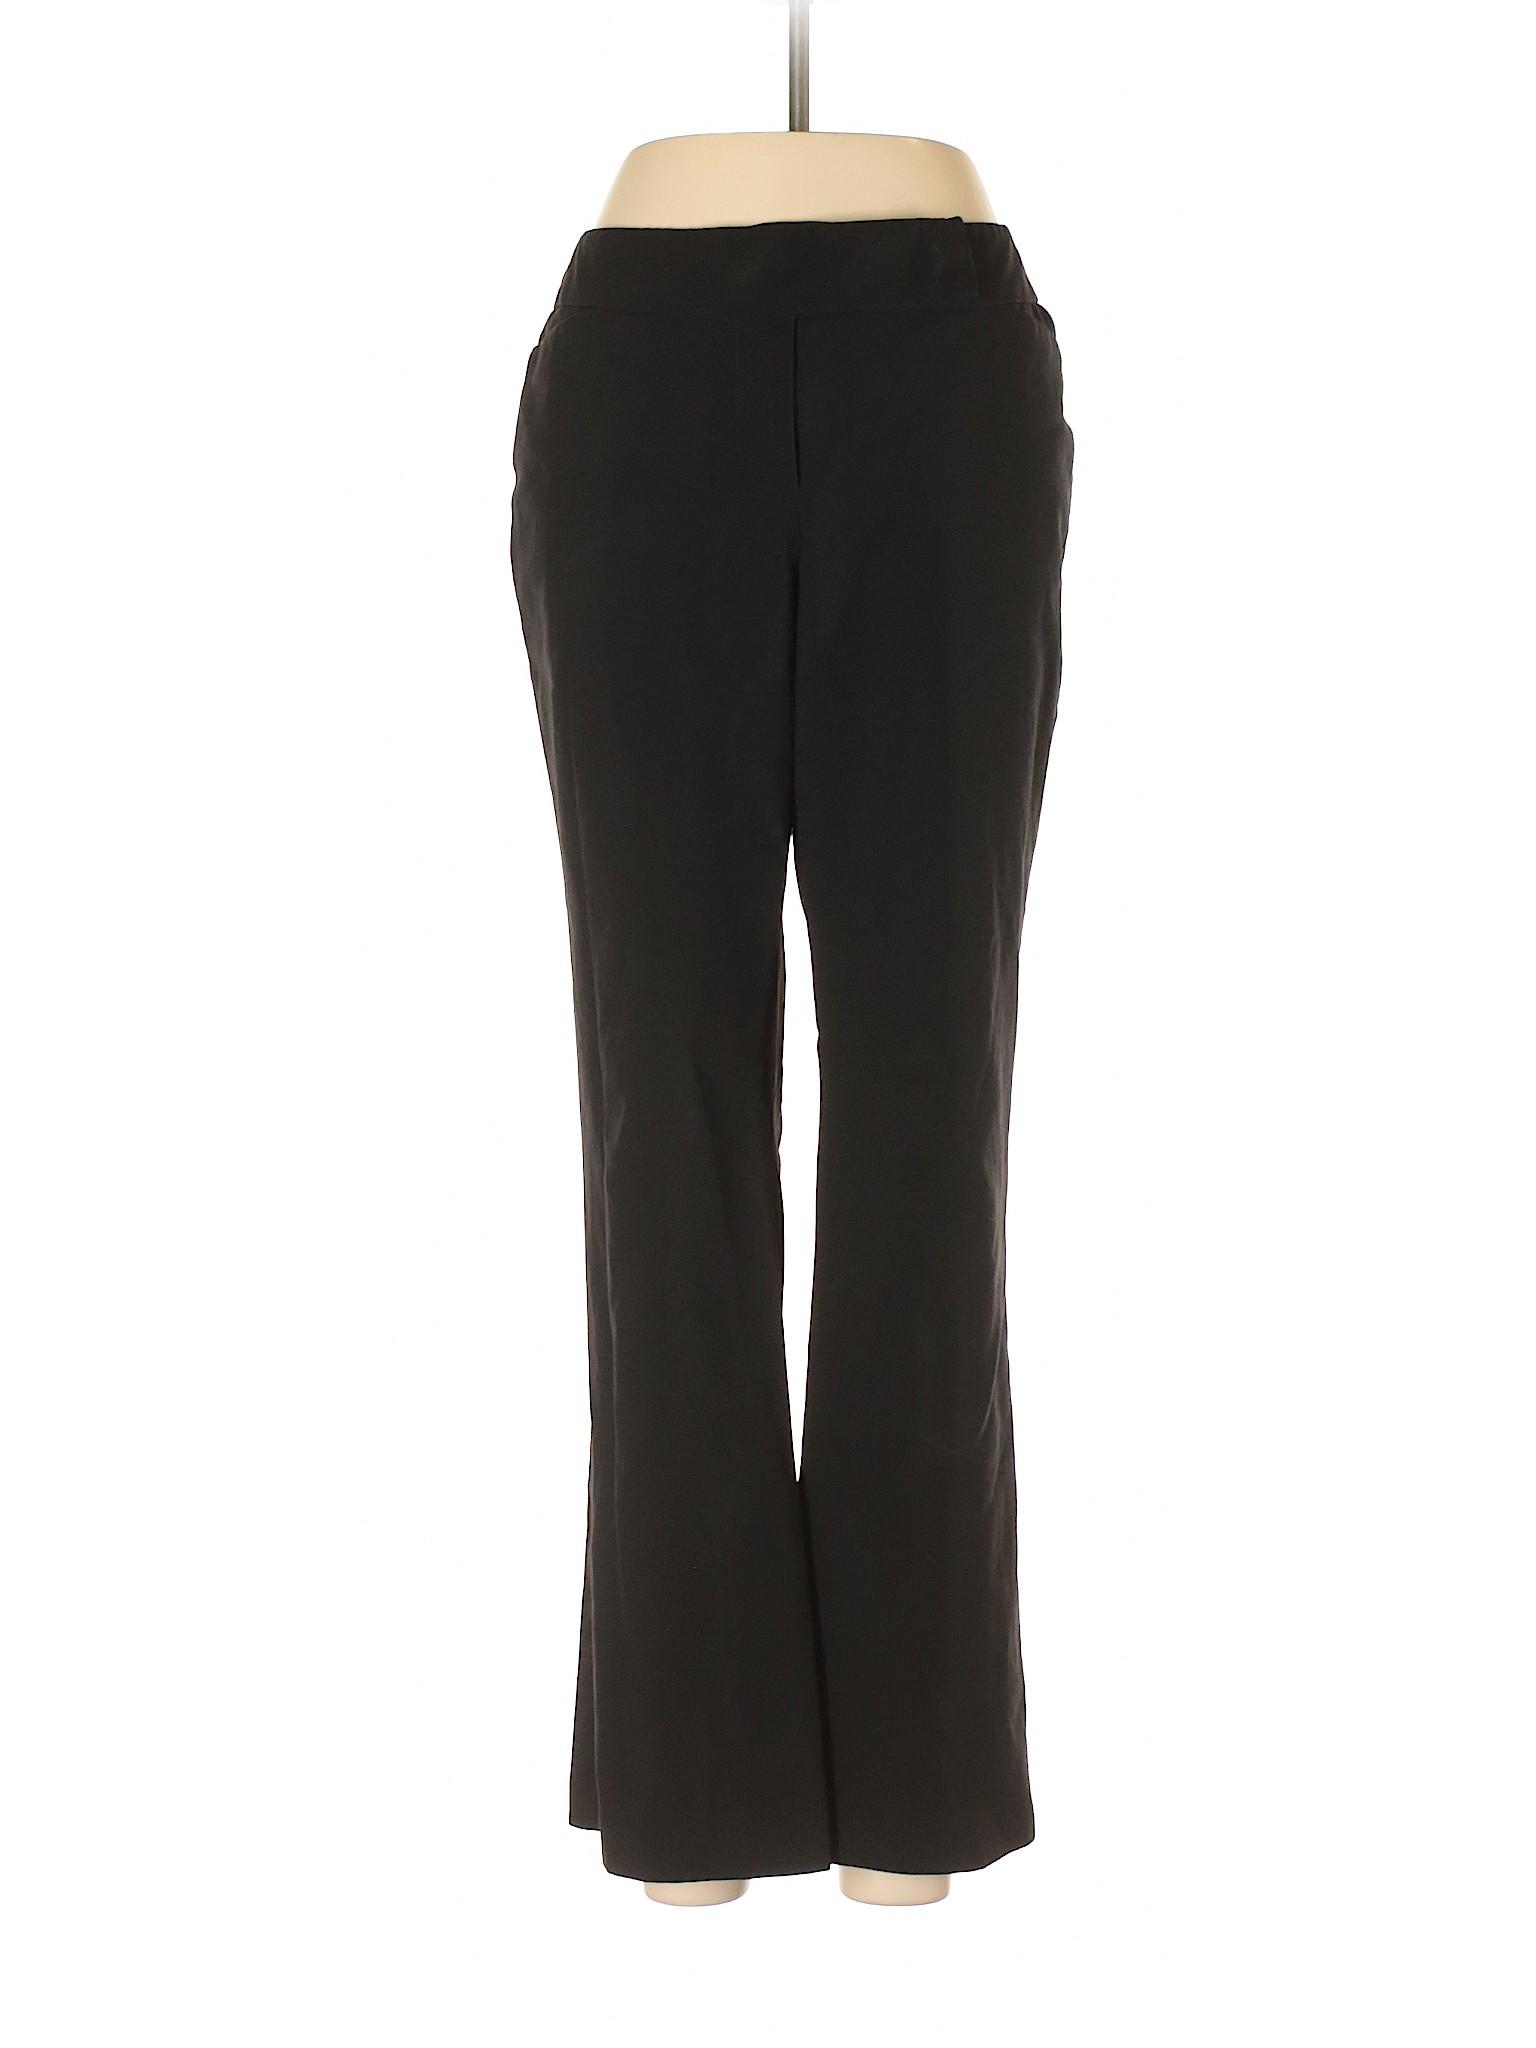 New Leisure winter Pants York amp; Company Dress WvWS0cfqPR